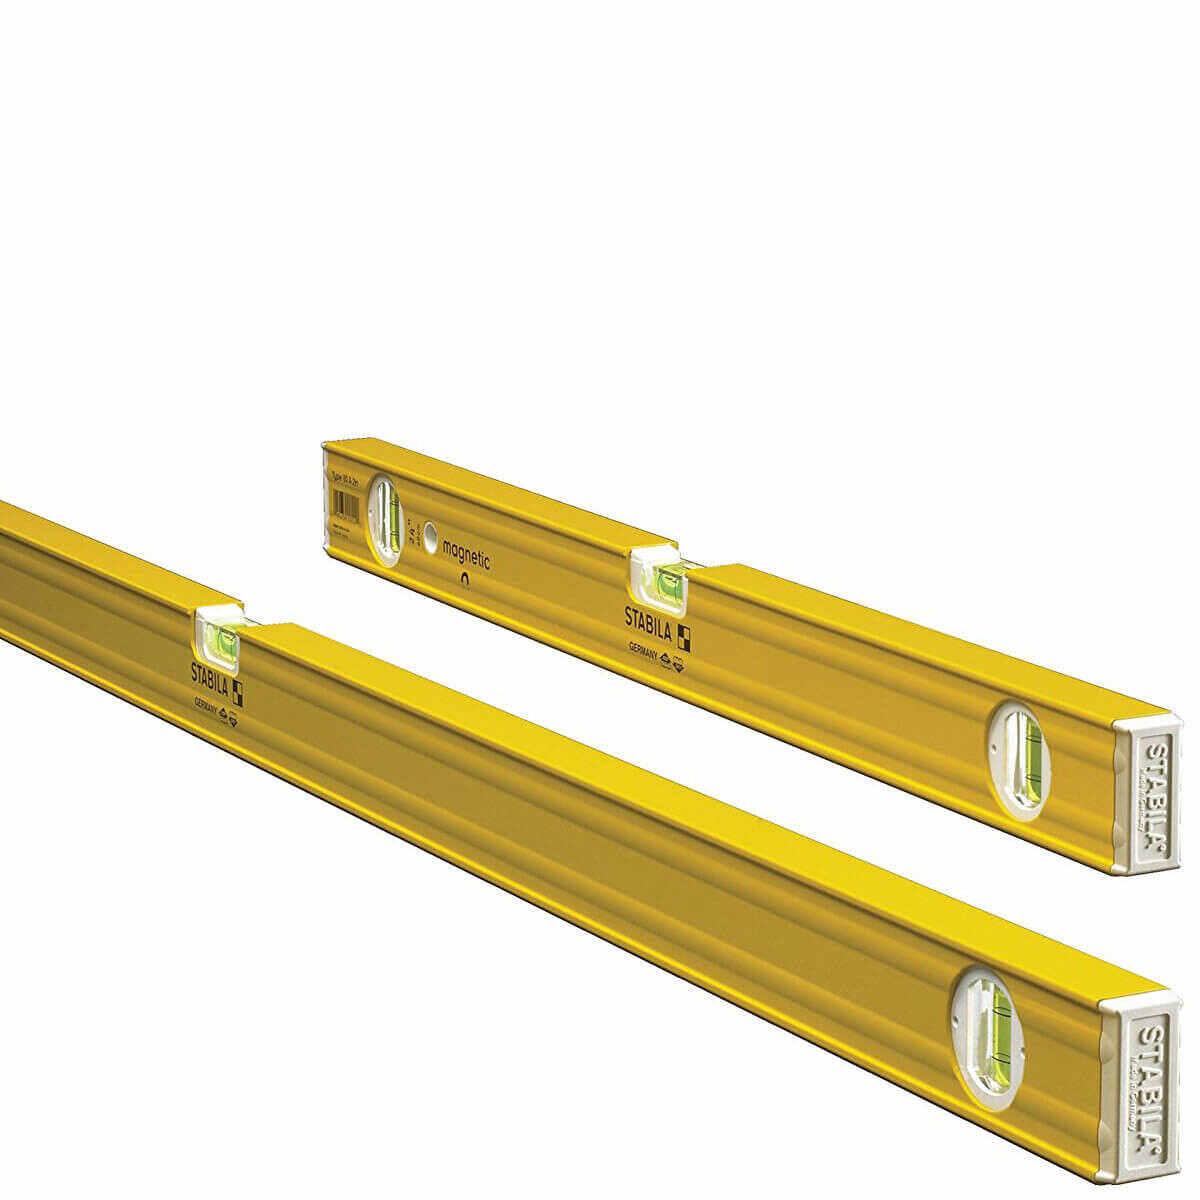 Stabila 24 and 48 inch Box Levels